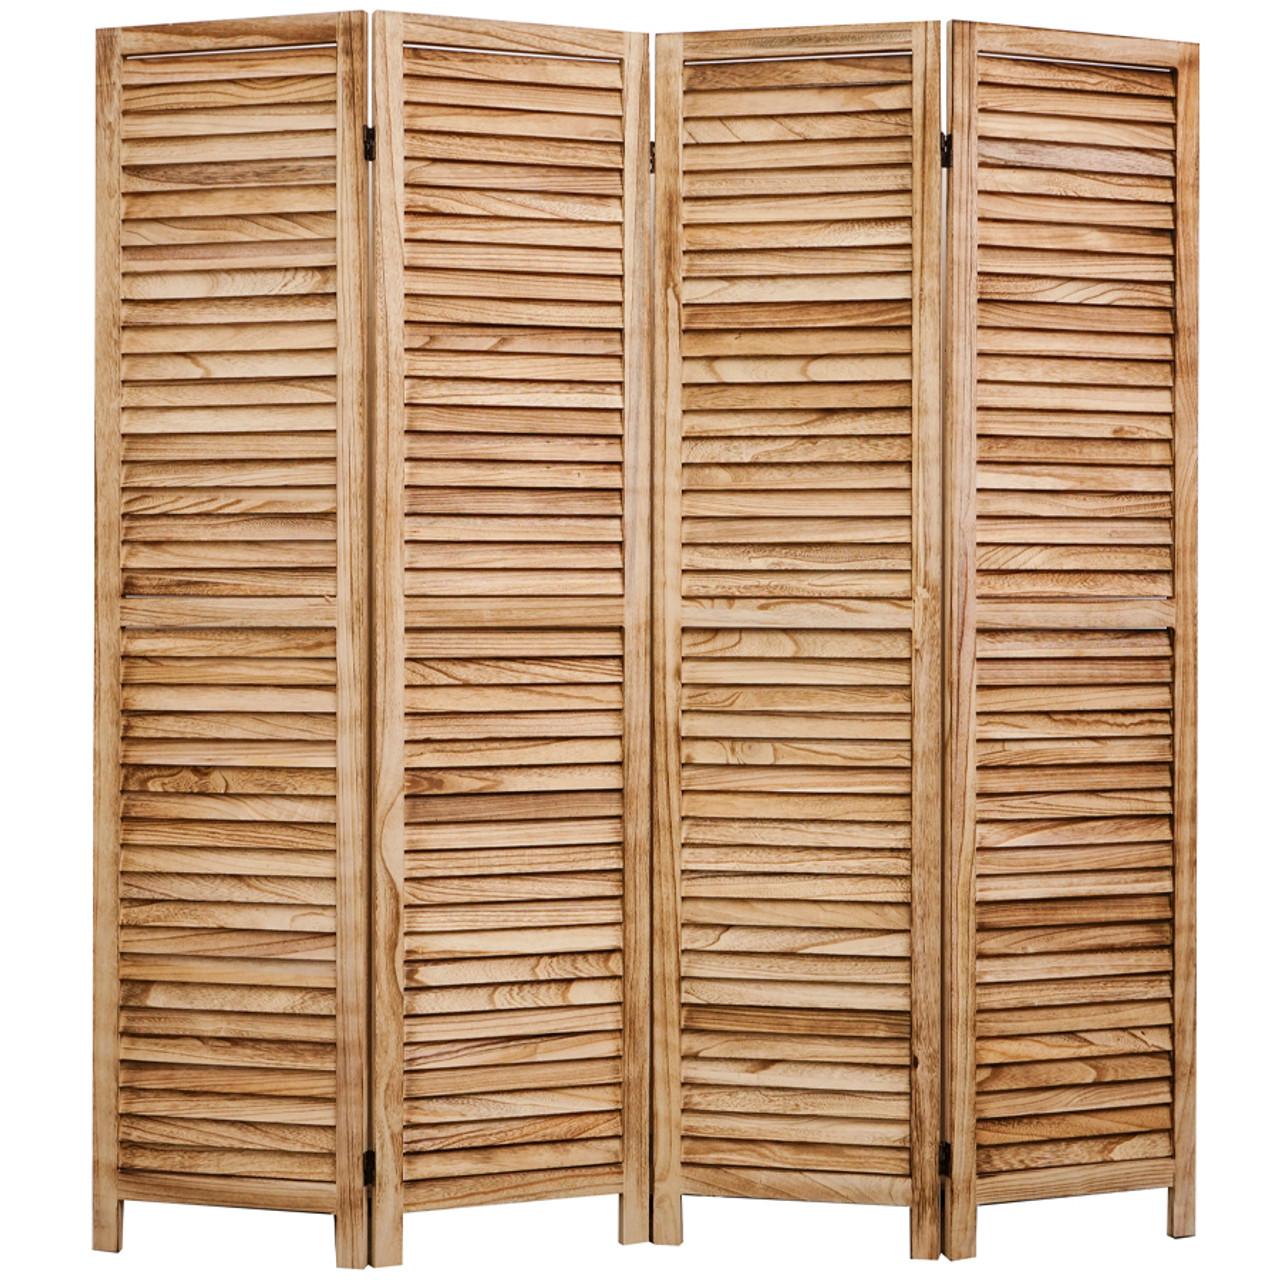 4, 6, 8 Panel Room Divider Full Length Wood Shutters Natural in USA, California, New York, New York City, Los Angeles, San Francisco, Pennsylvania, Washington DC, Virginia, Maryland